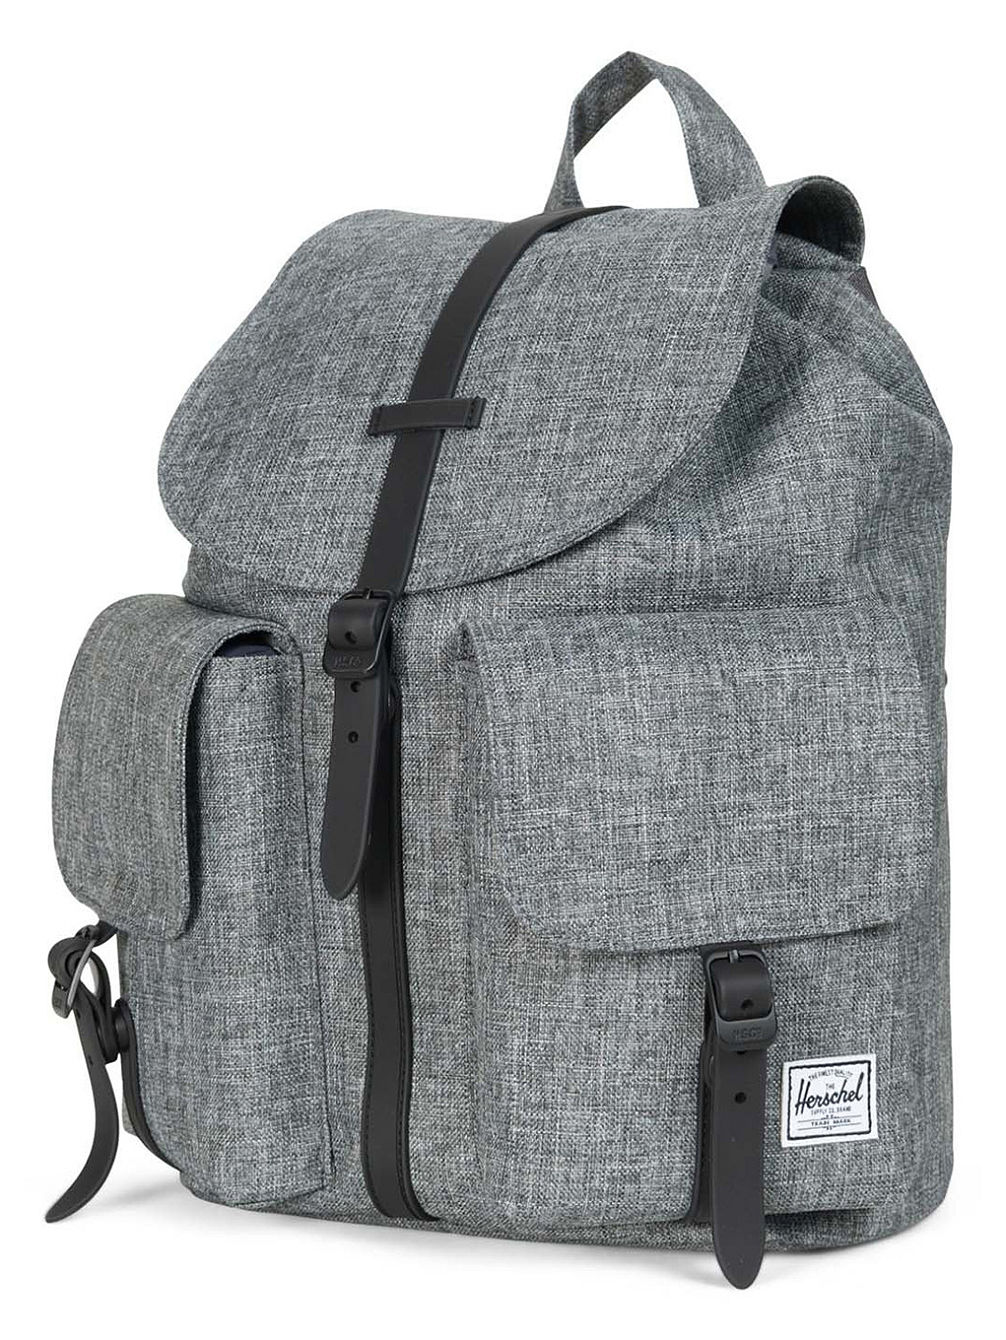 31ee89c0fc17f Buy Herschel Dawson Backpack online at Blue Tomato